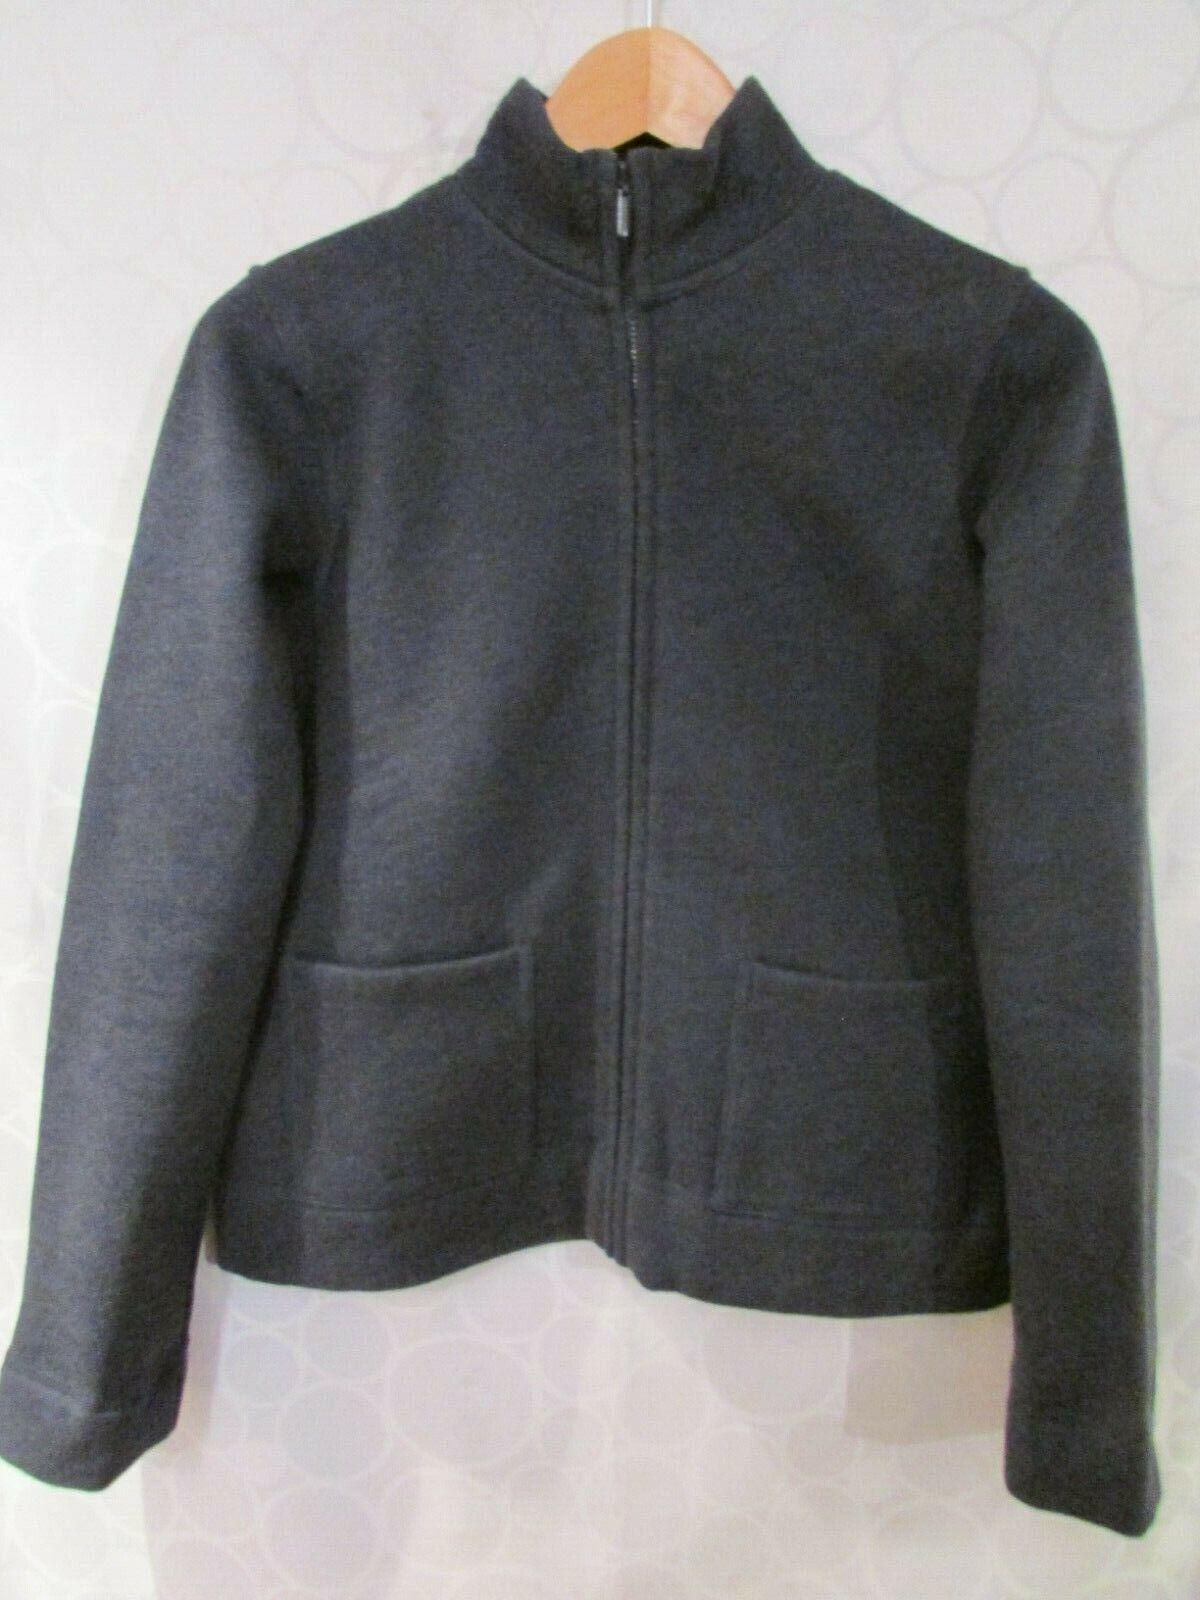 EILEEN FISHER bluee Cotton Blend Full Zip Fleece Cardigan Sweater Size PP